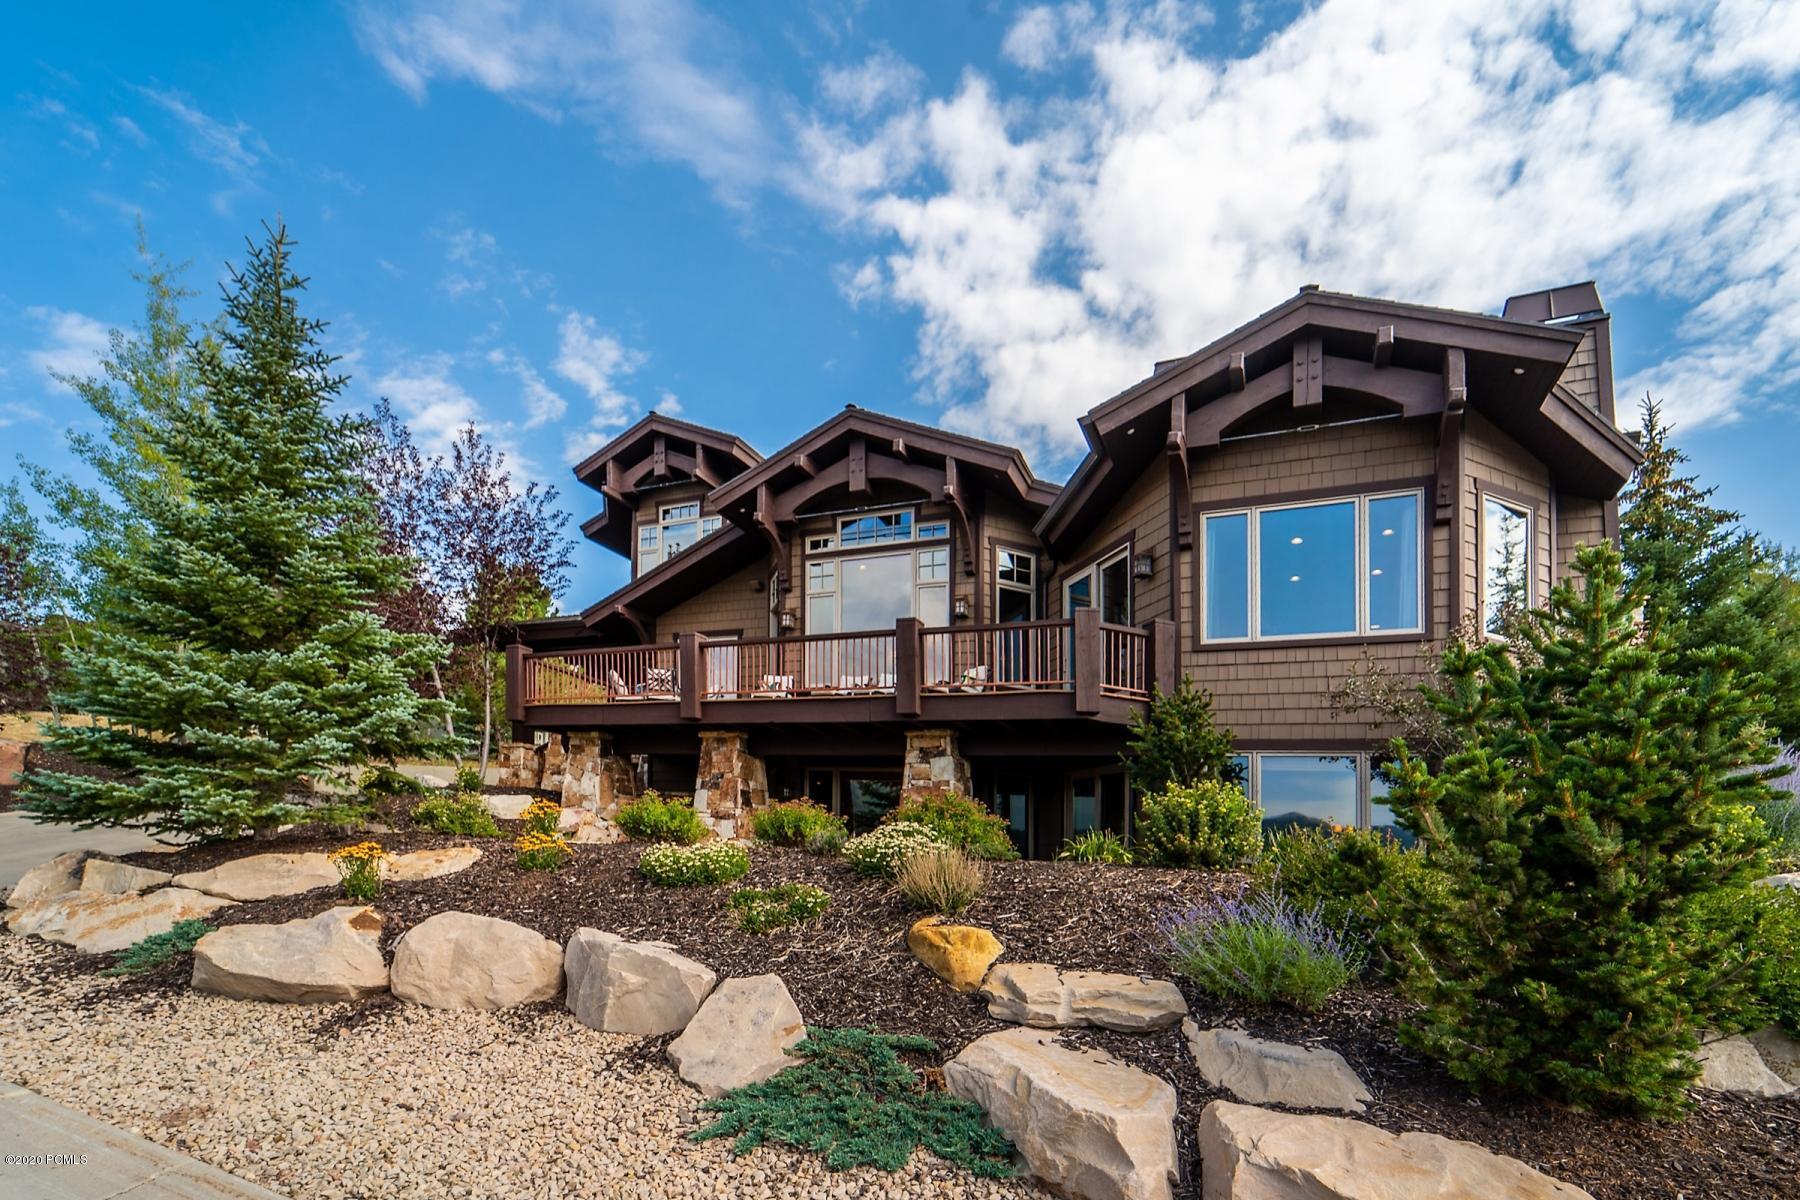 2540 Larkspur Drive, Park City, Utah 84060, 4 Bedrooms Bedrooms, ,5 BathroomsBathrooms,Single Family,For Sale,Larkspur,12003095